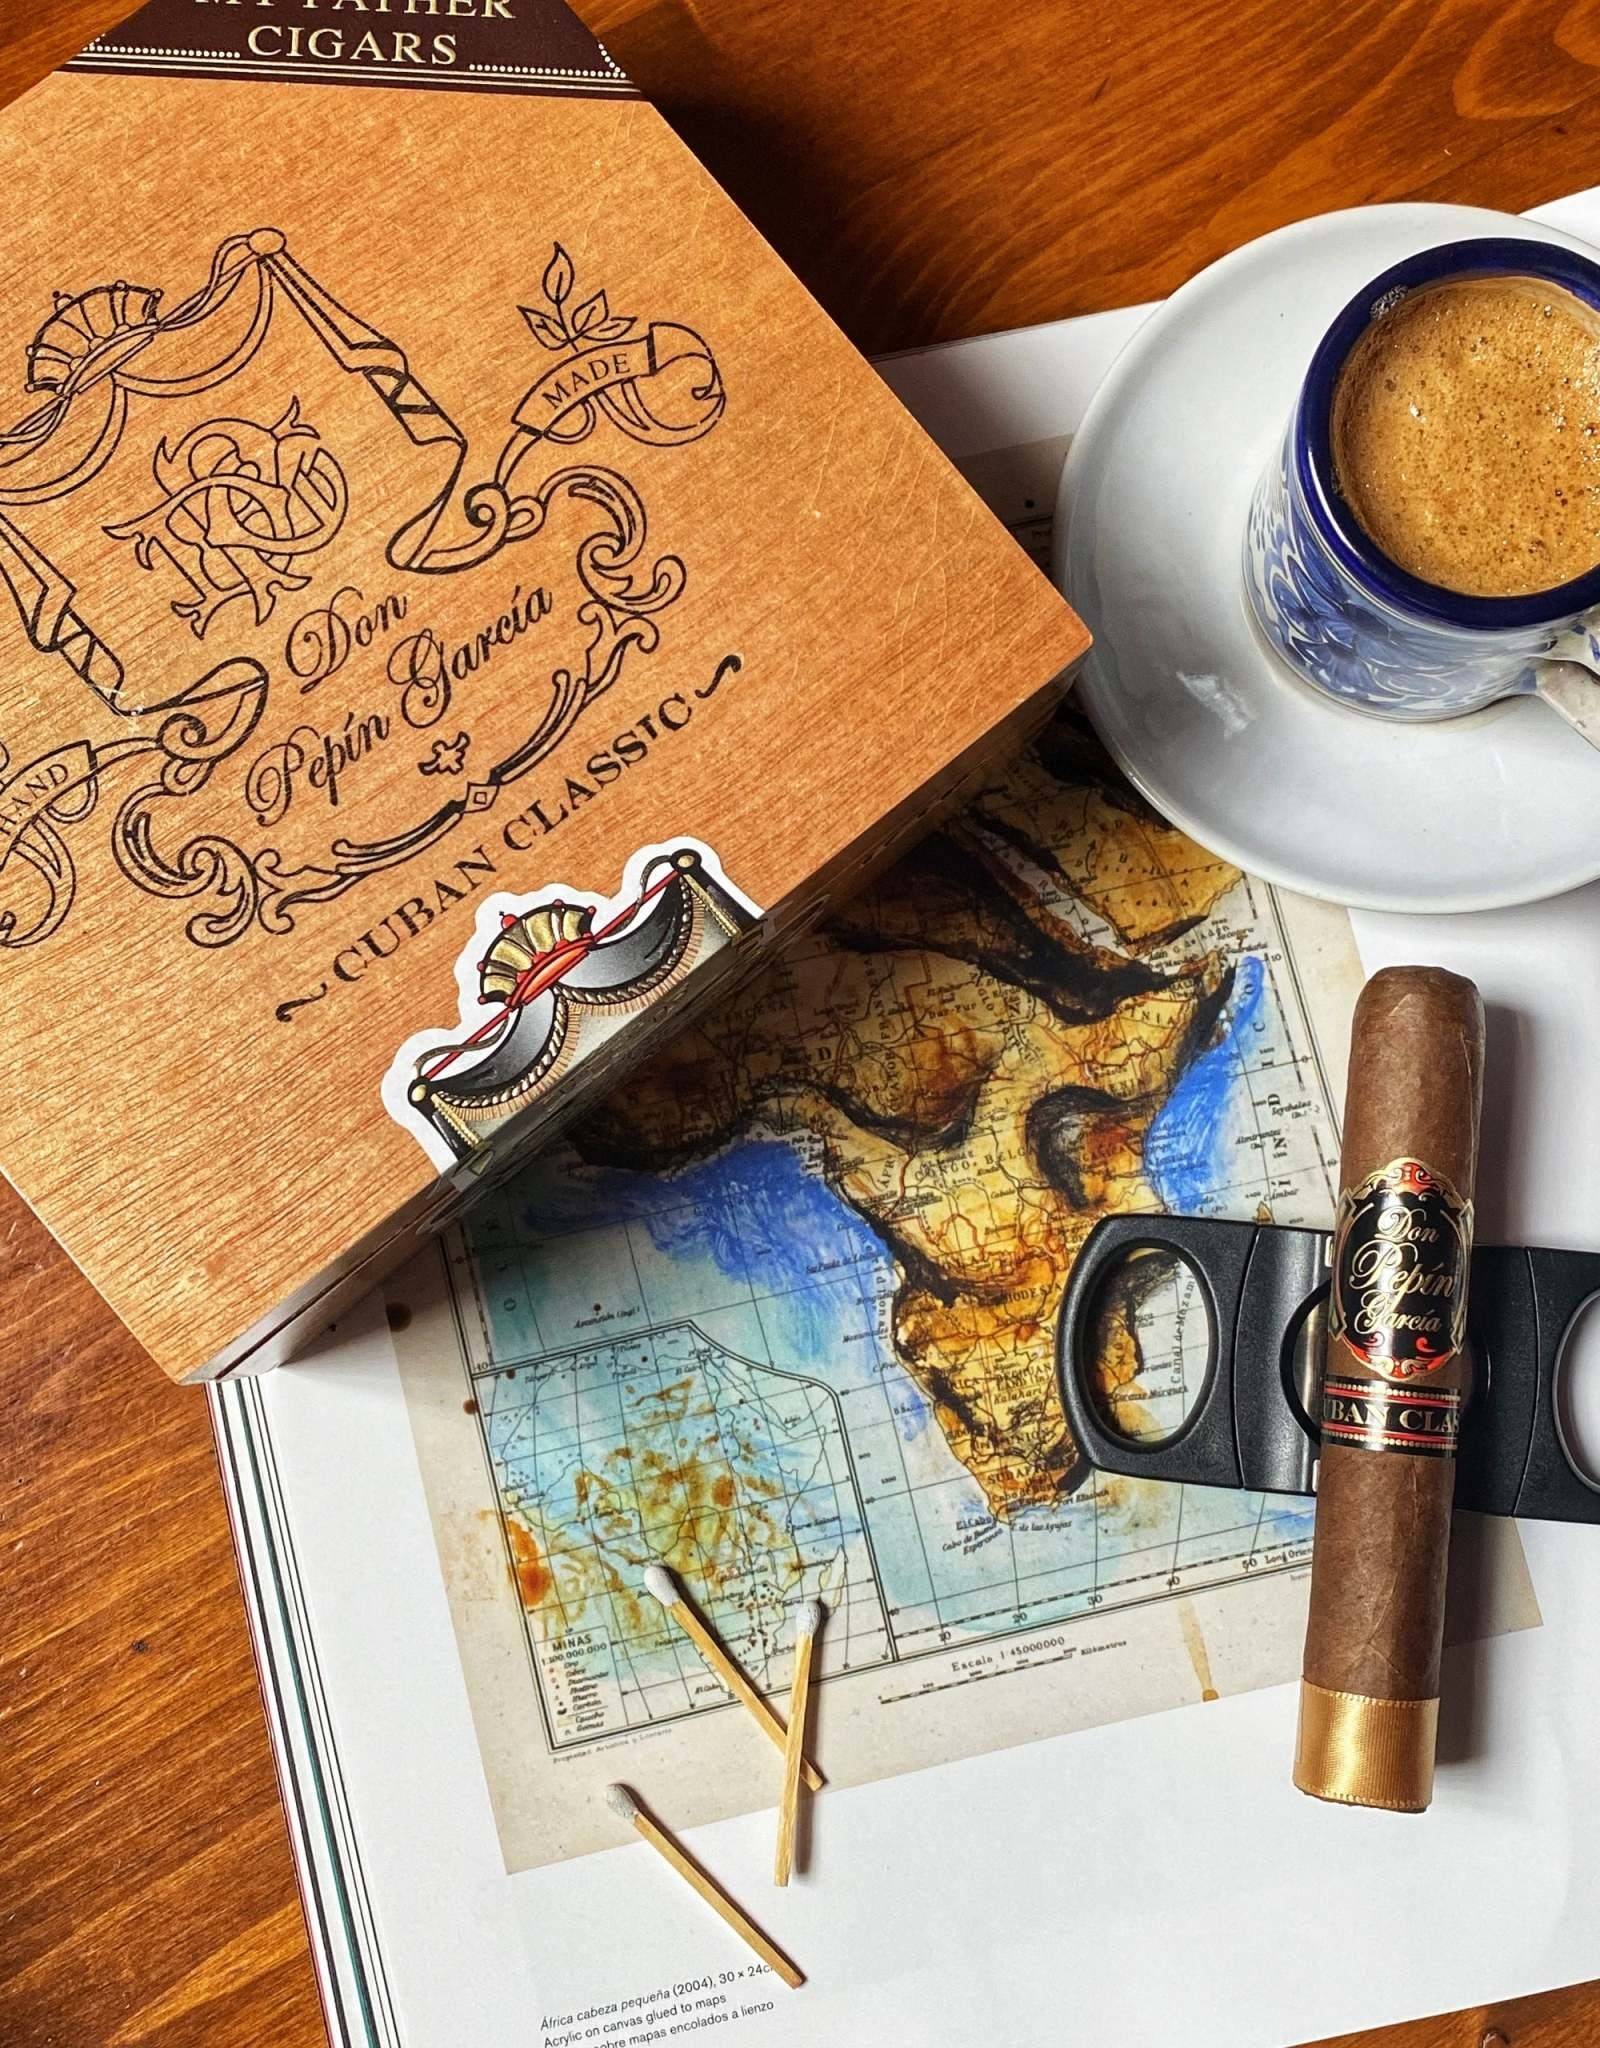 My Father Cigars My Father Don Pepin Garcia Black Cuban Classic 1979 Robusto 5 x 50